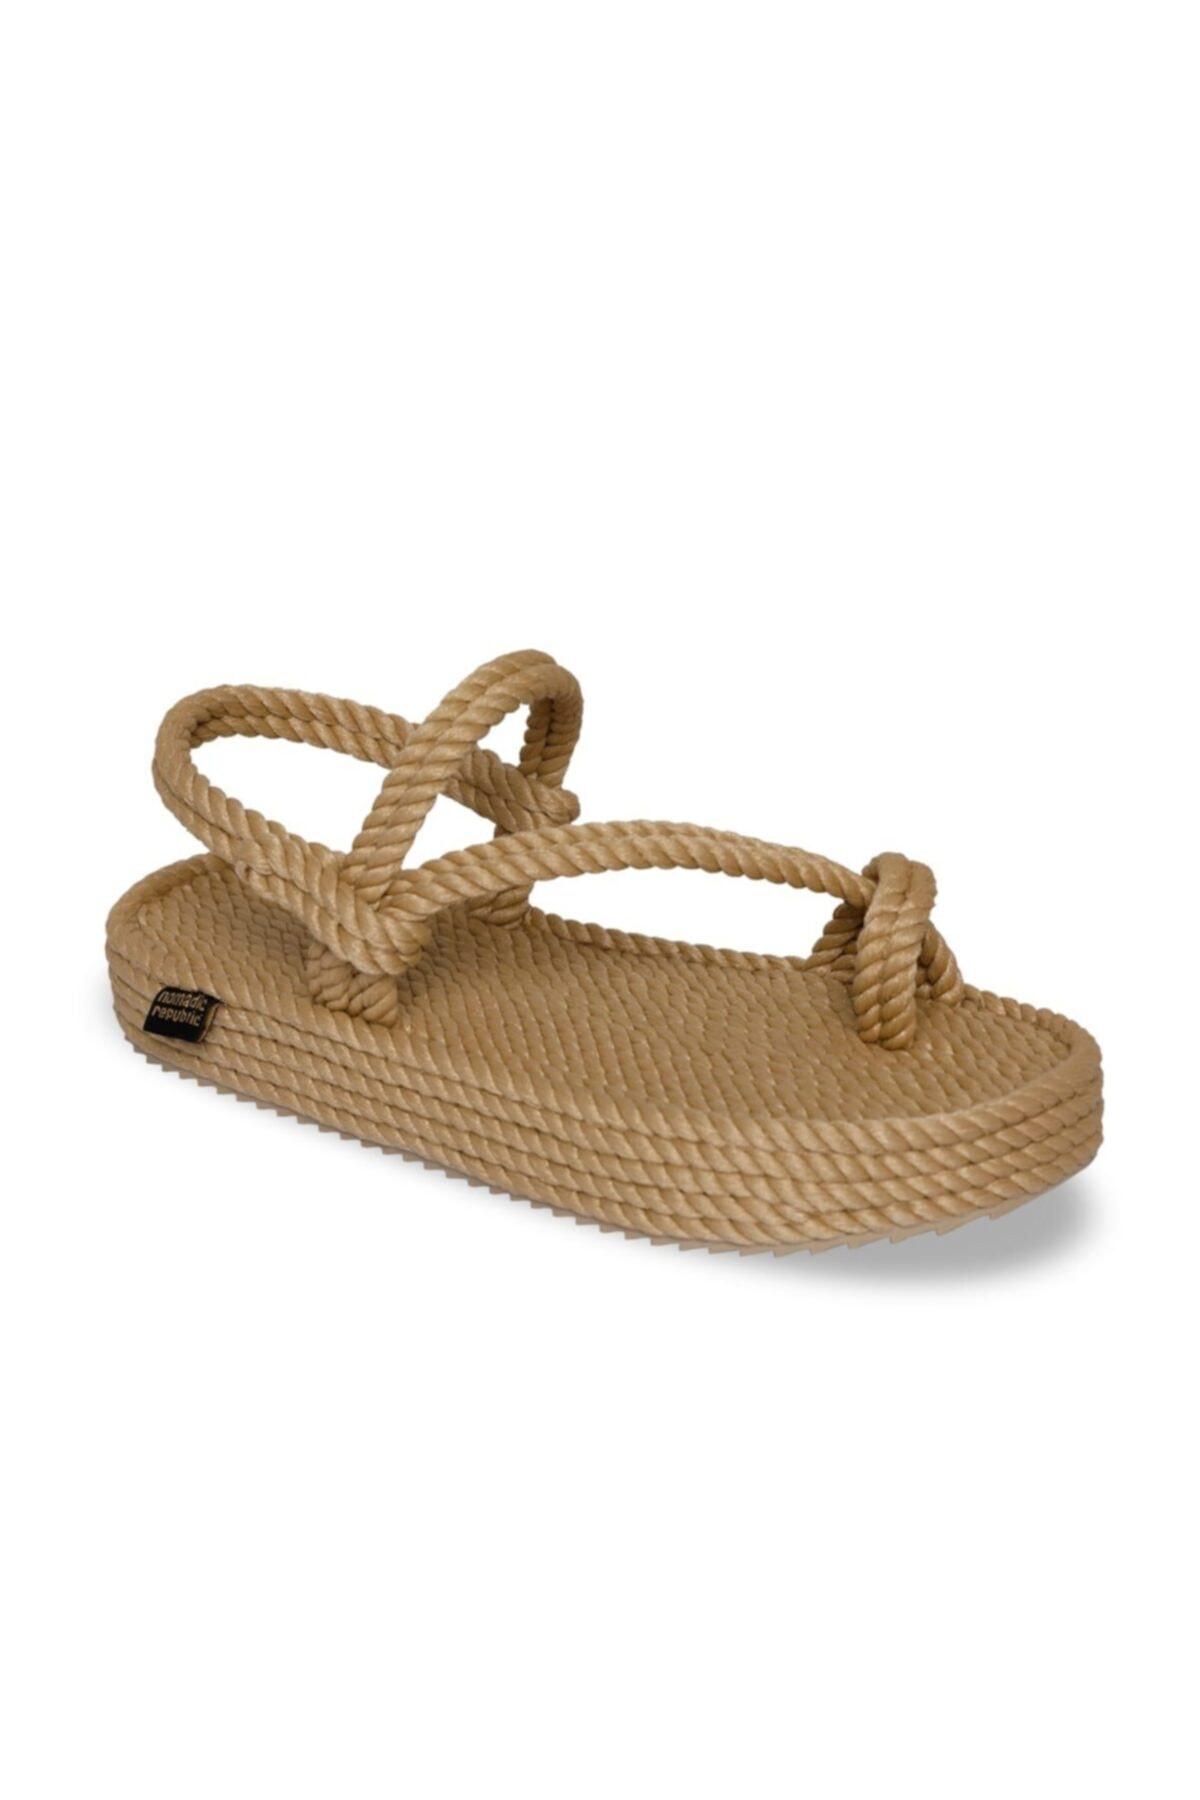 Nomadic Republic Hawaii Platform Kadın Halat & İp Sandalet - Bej 1